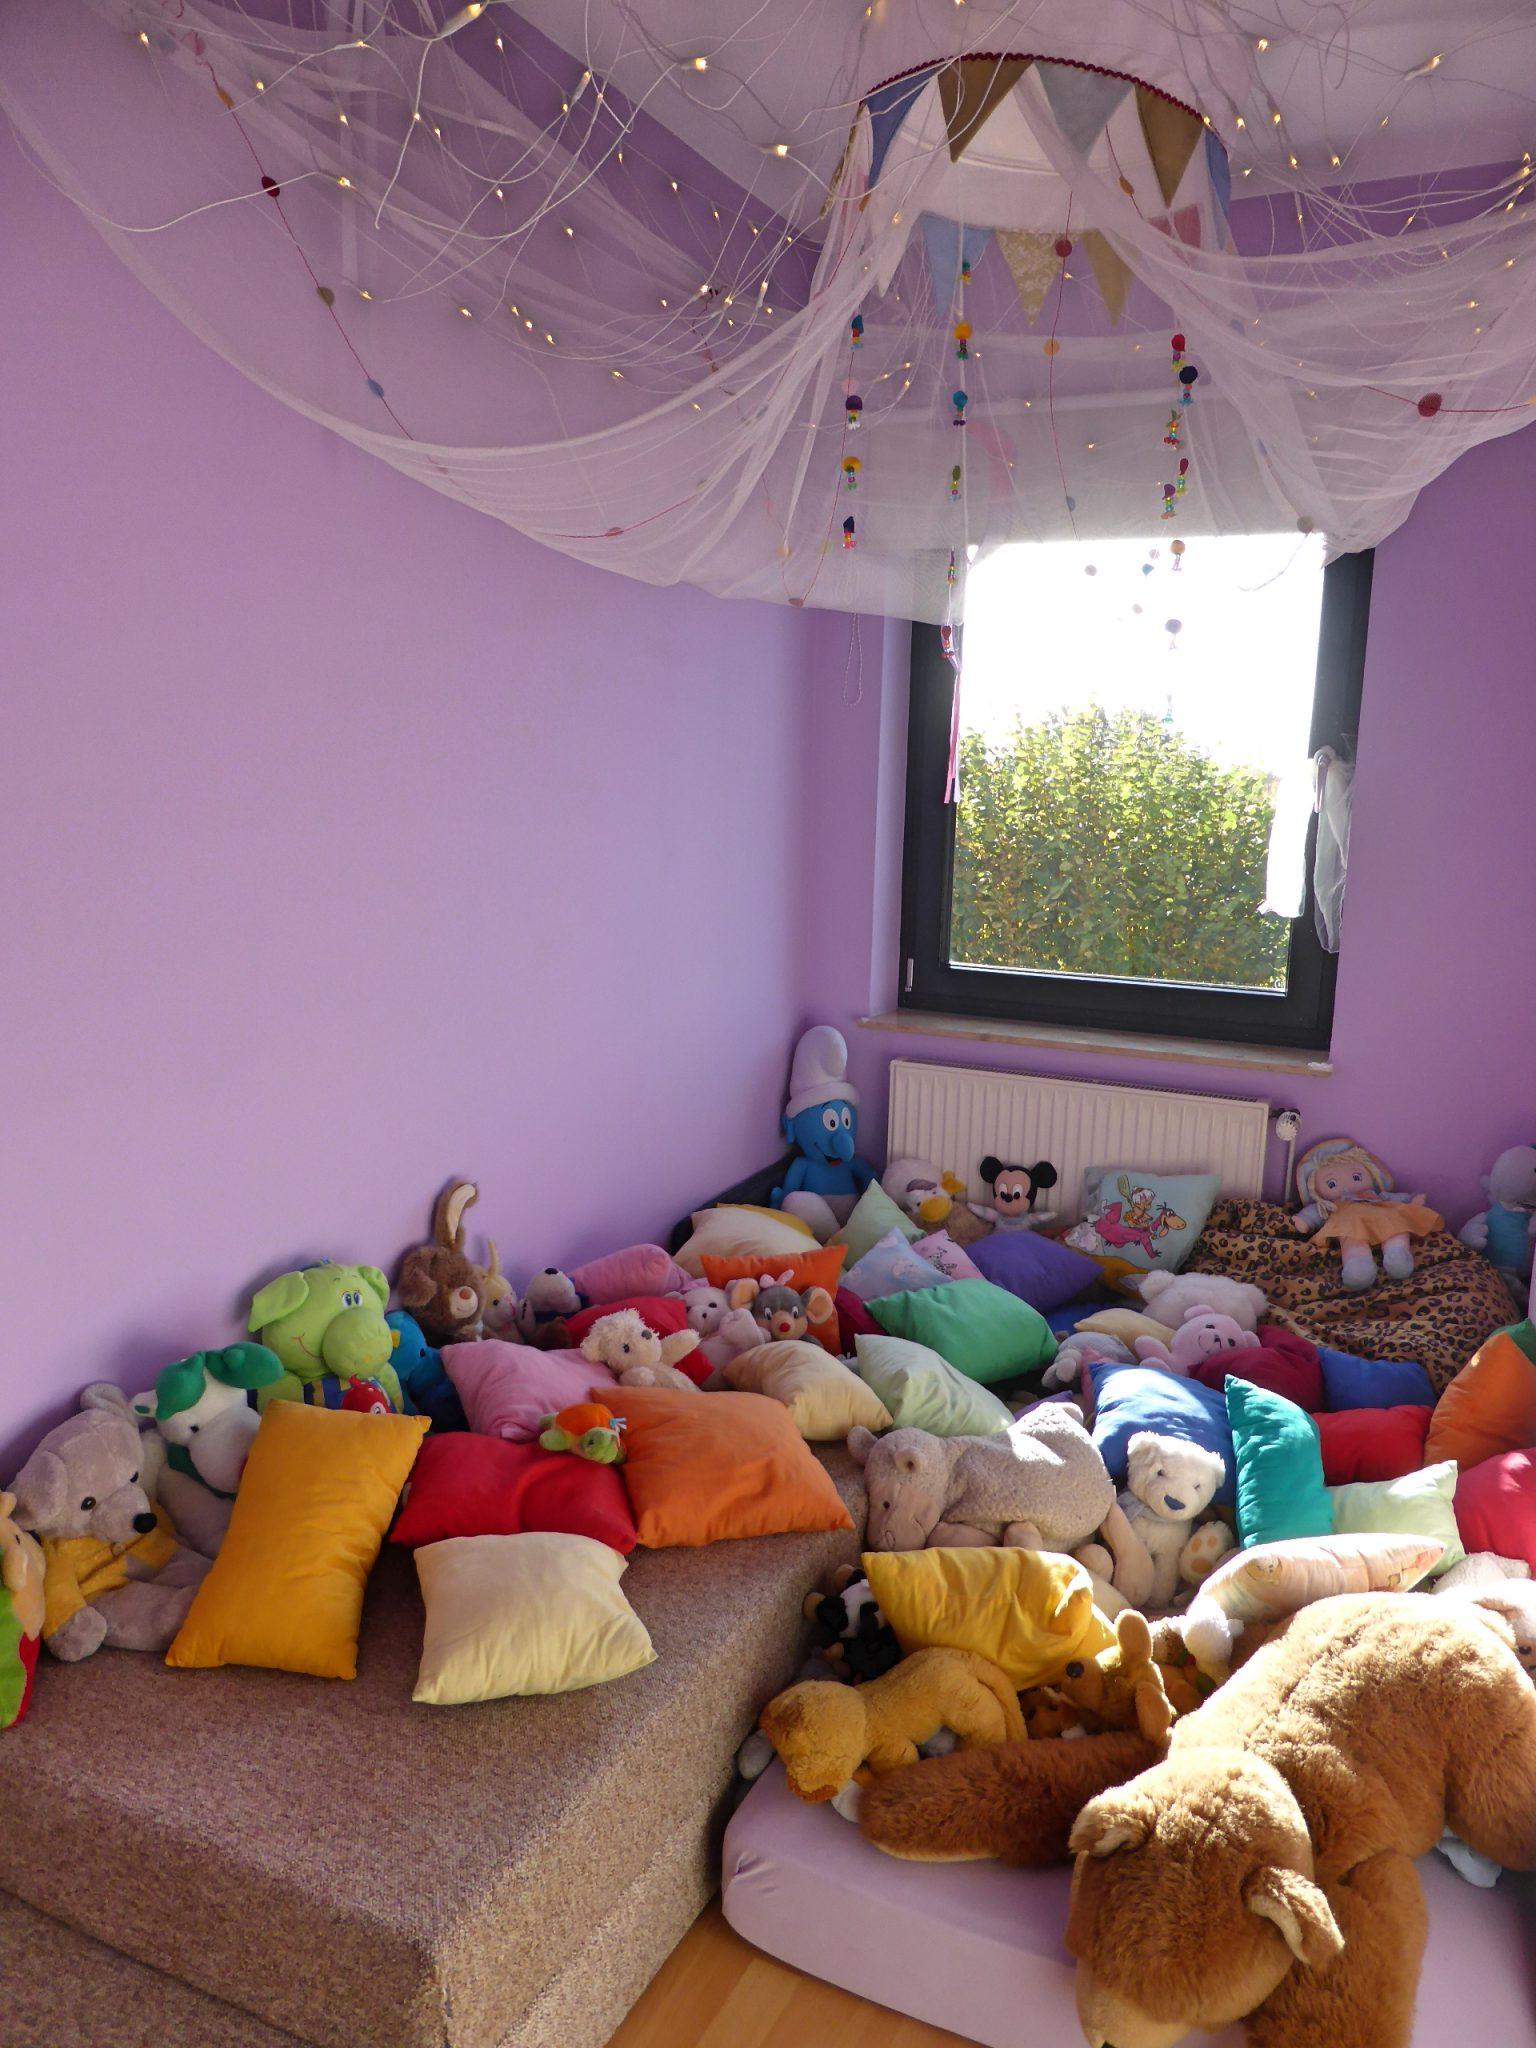 Snozzle 2 Kita Kid Zone Kinderbetreuung - Snoozleraum